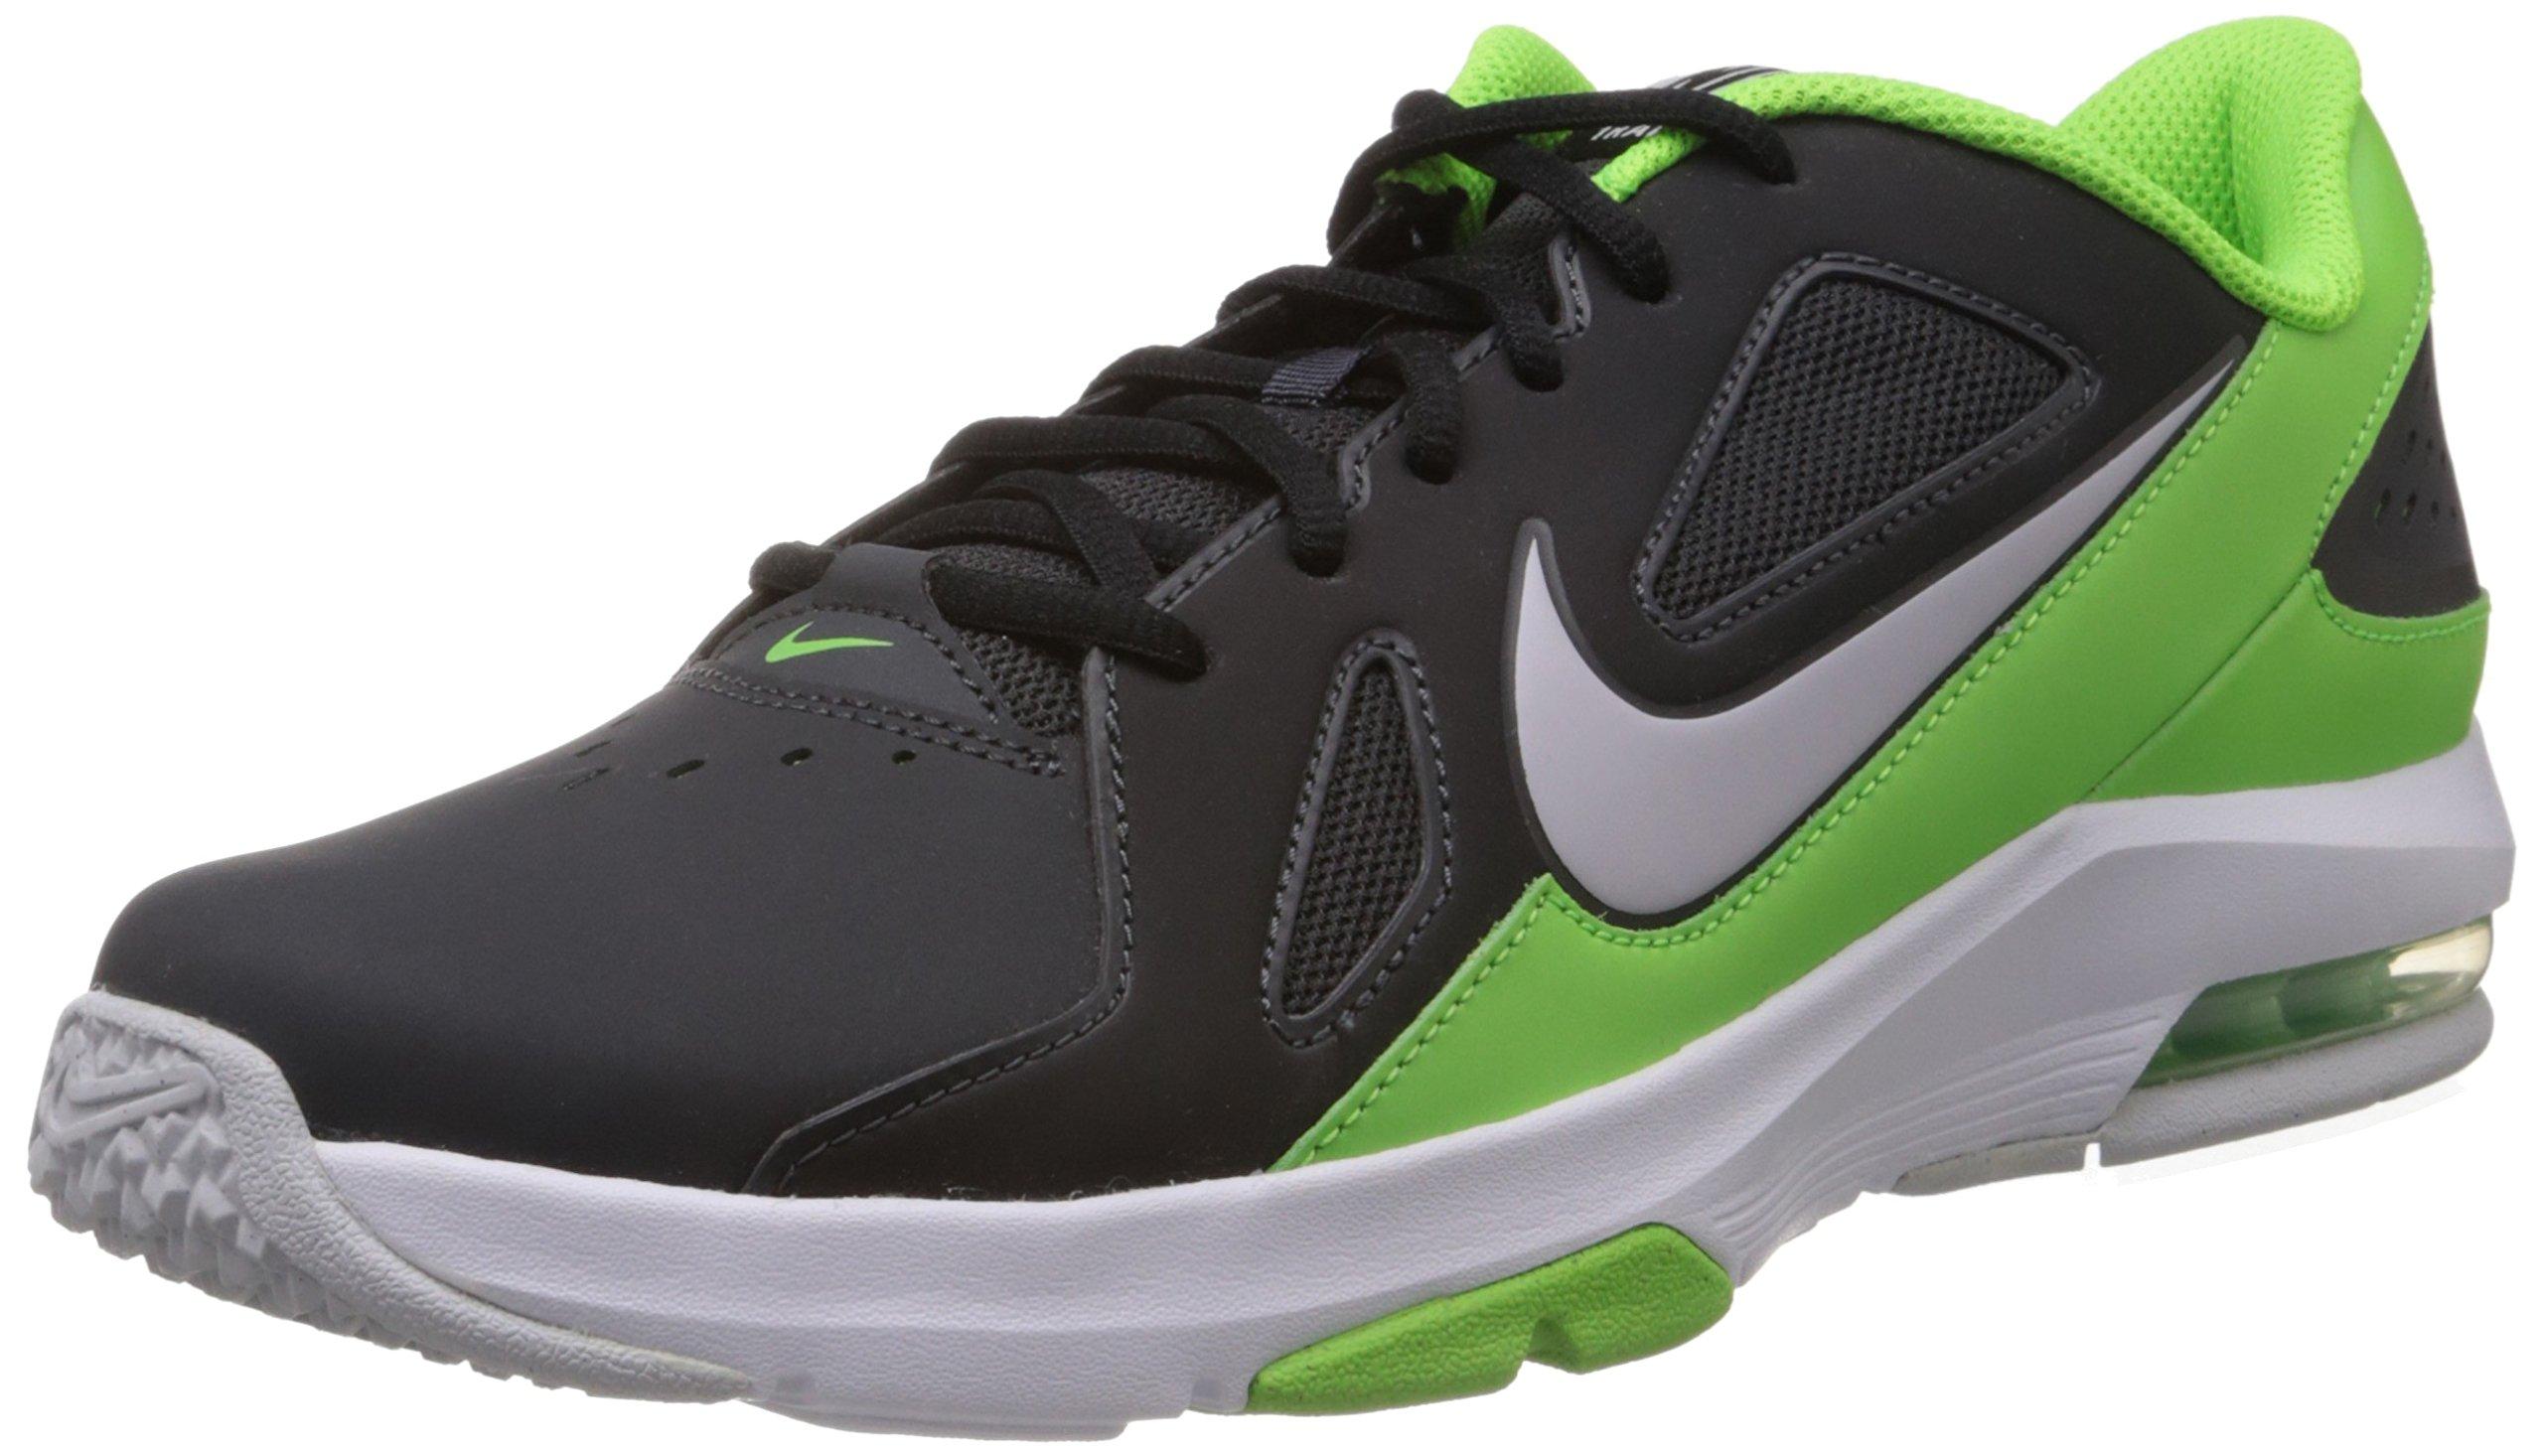 Nike Men's Air Max Crusher Multisport Training Shoes